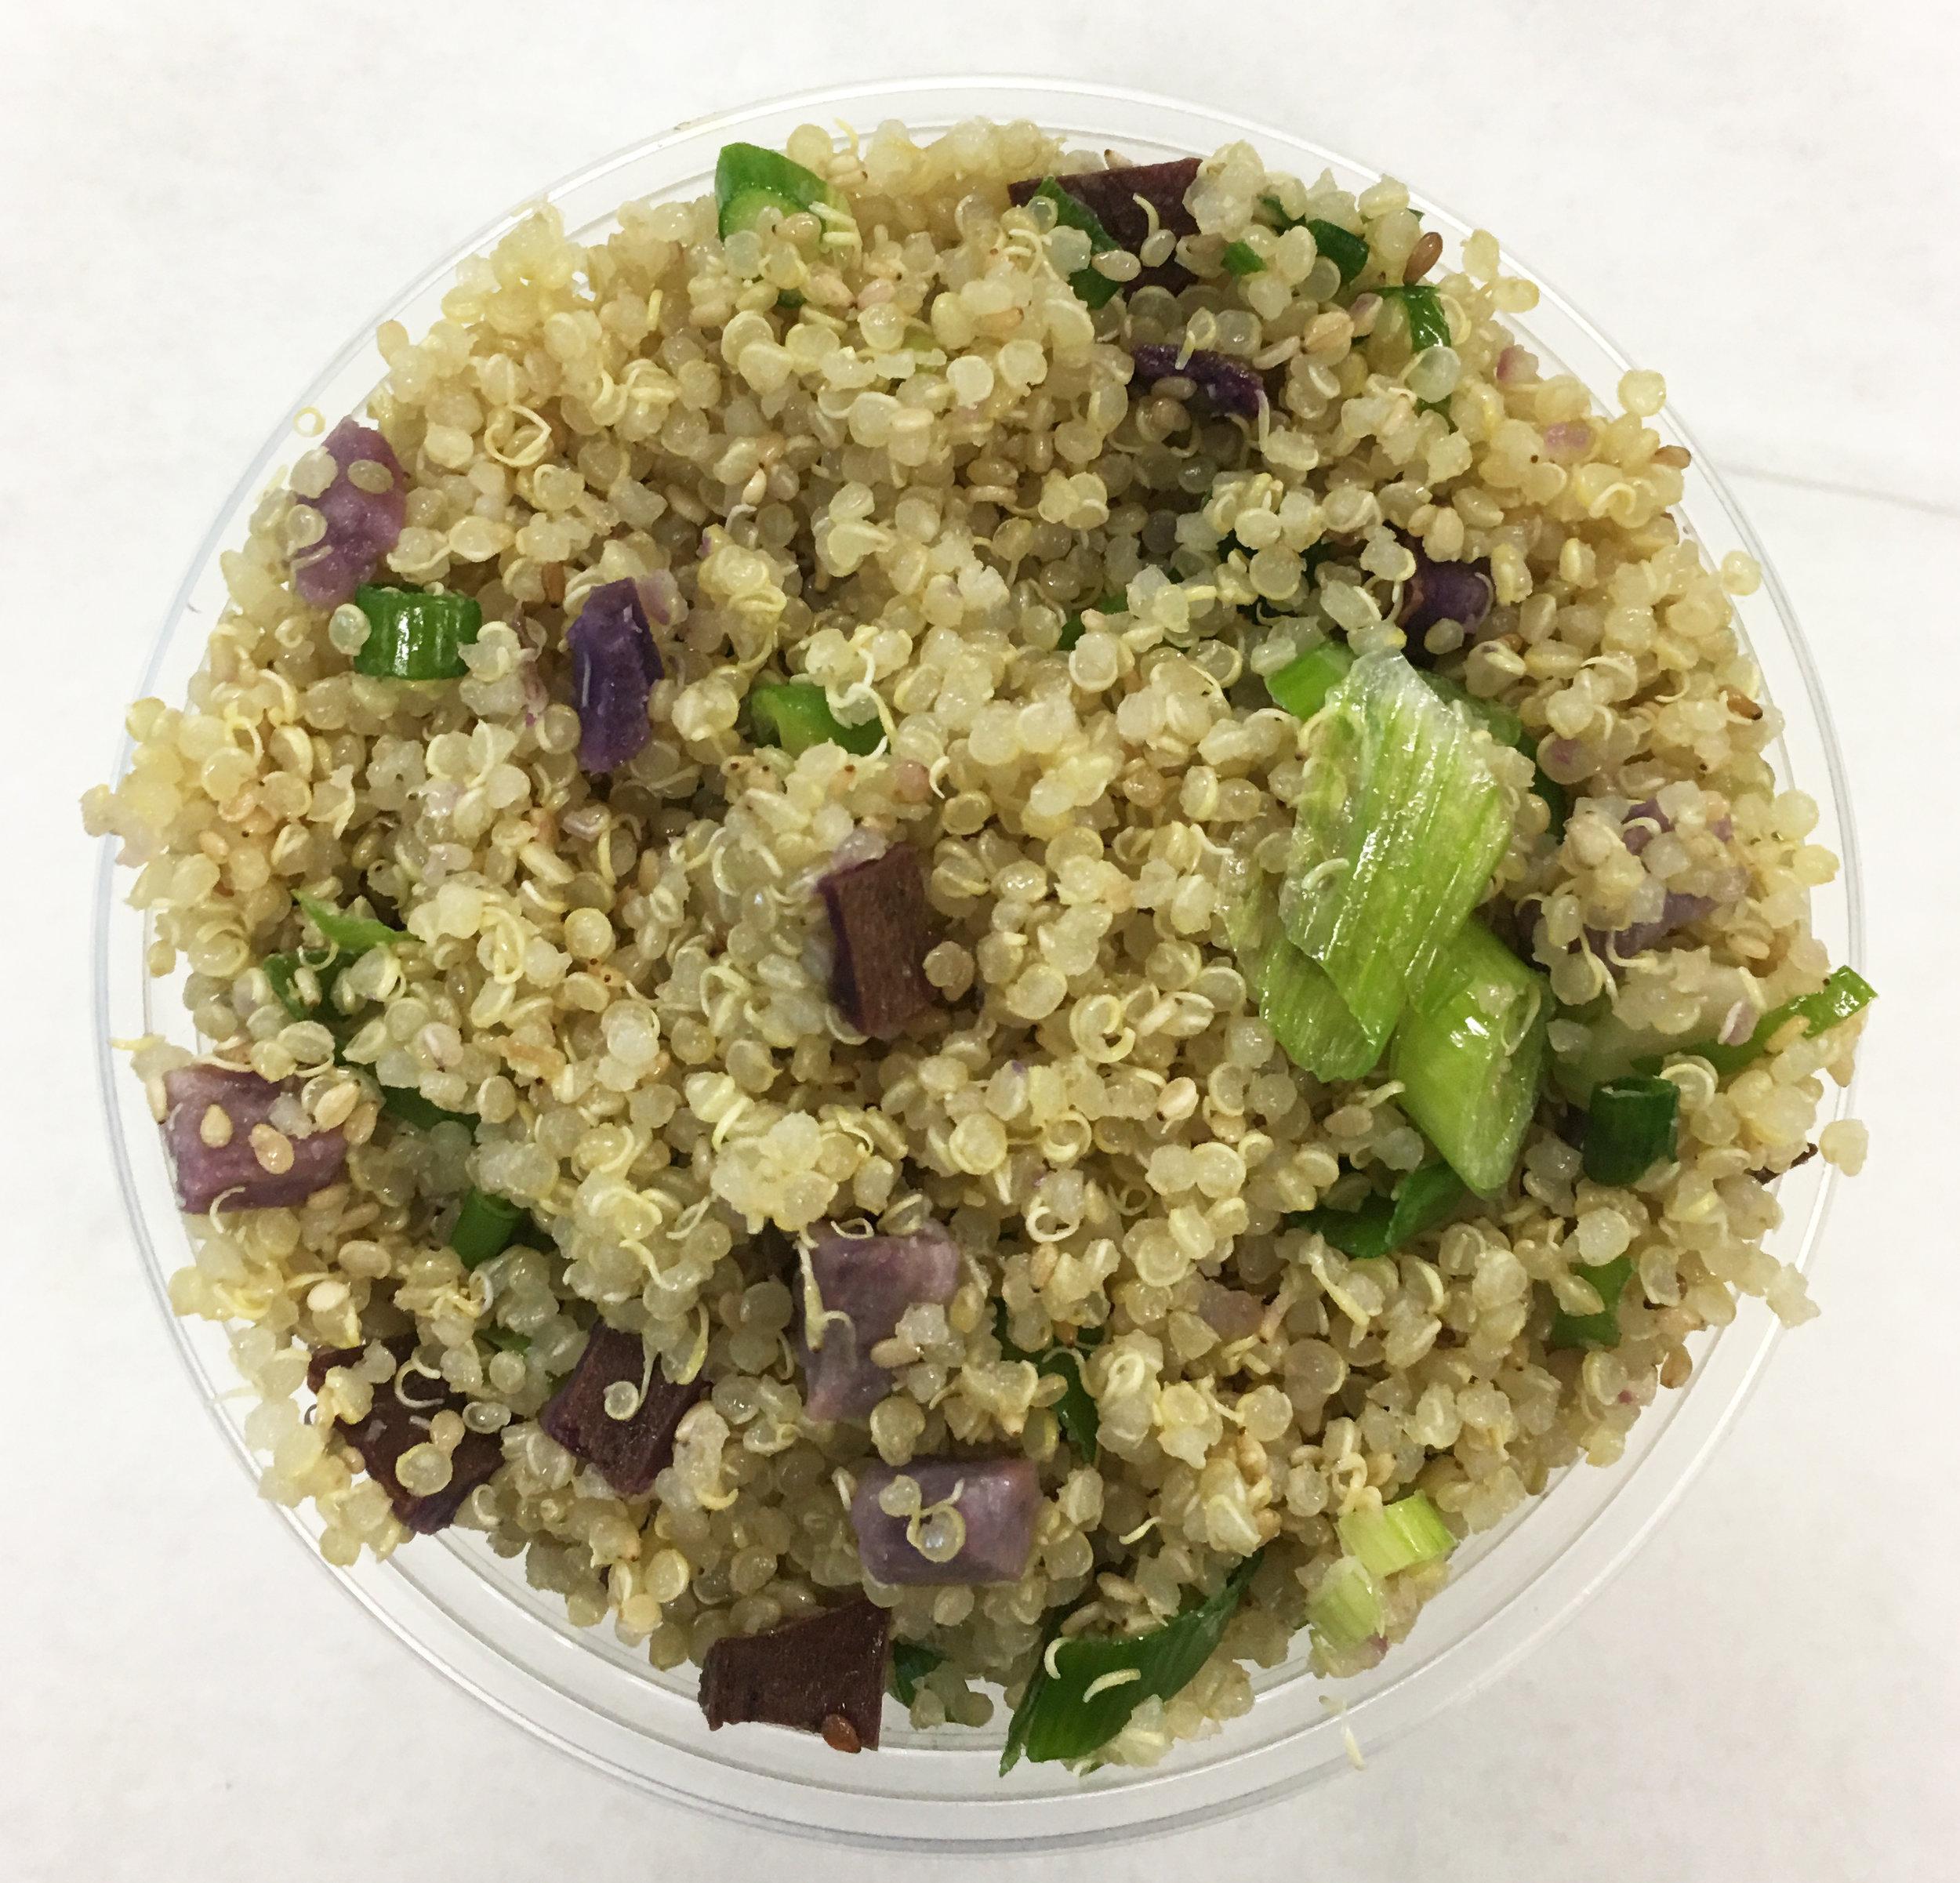 Quinoa with purple yams and scallions.